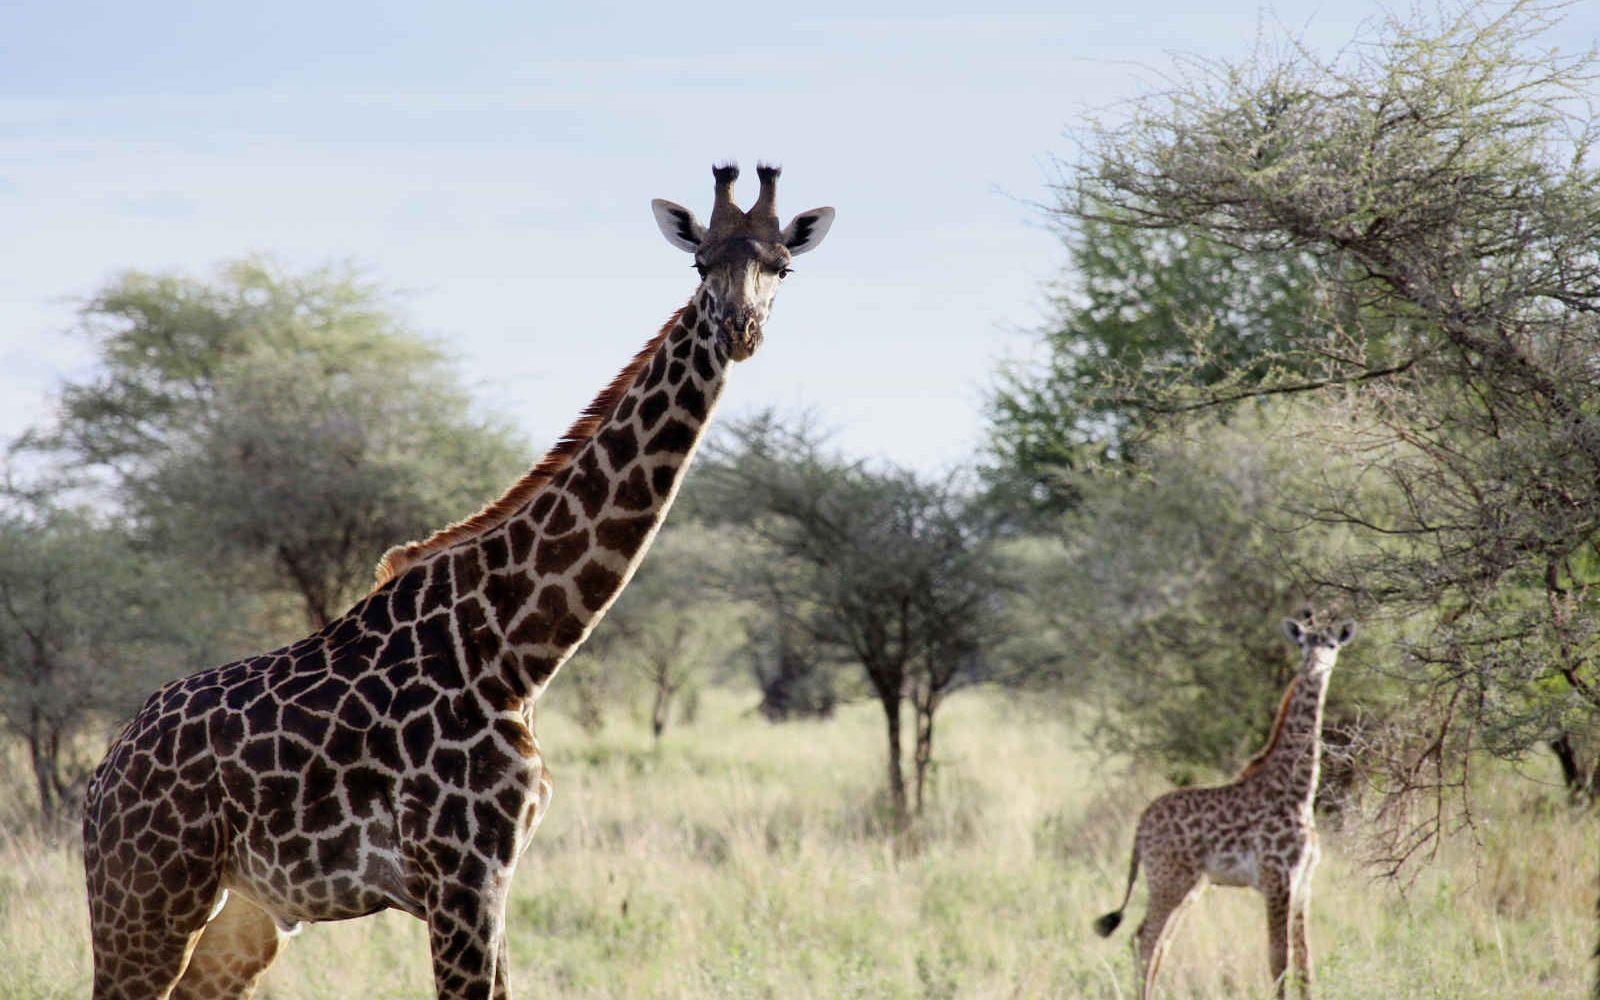 Girafe, parc national de Tarangire, Tanzanie